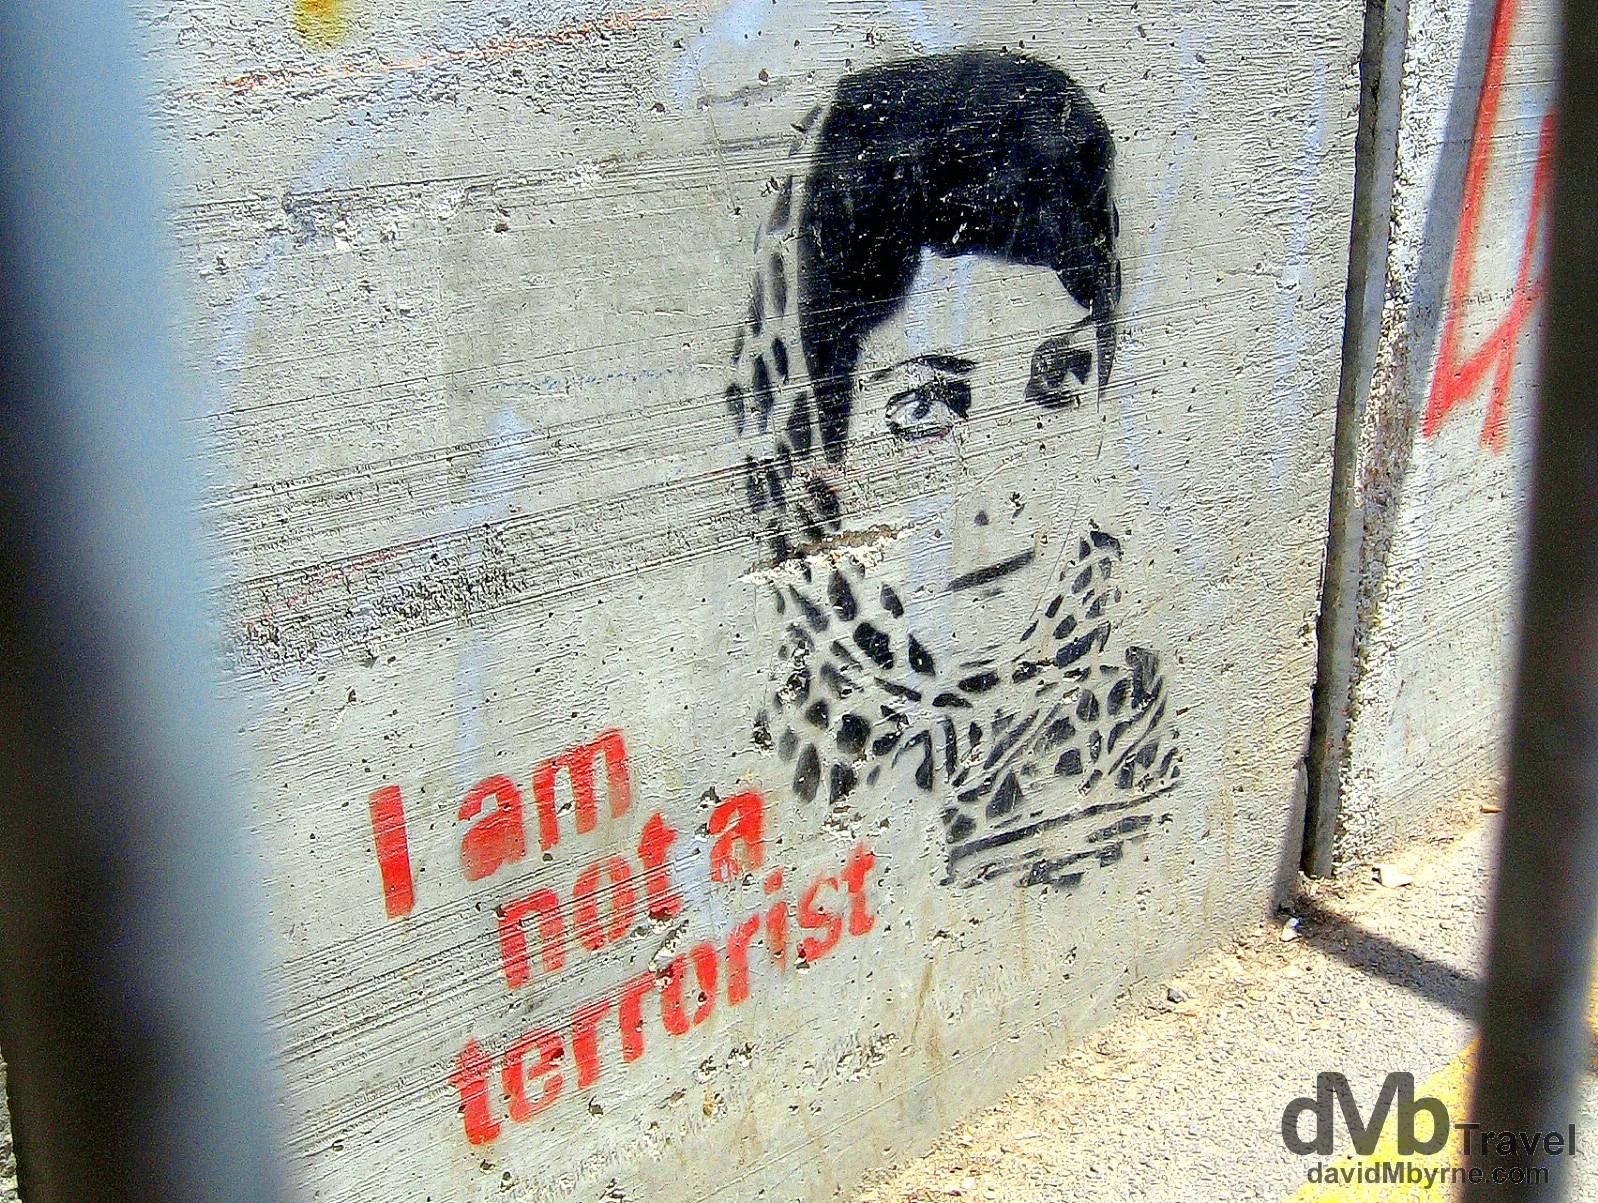 Israel-West Bank Barrier Art & Israel-West Bank Barrier Art - Worldwide Destination Photography ...